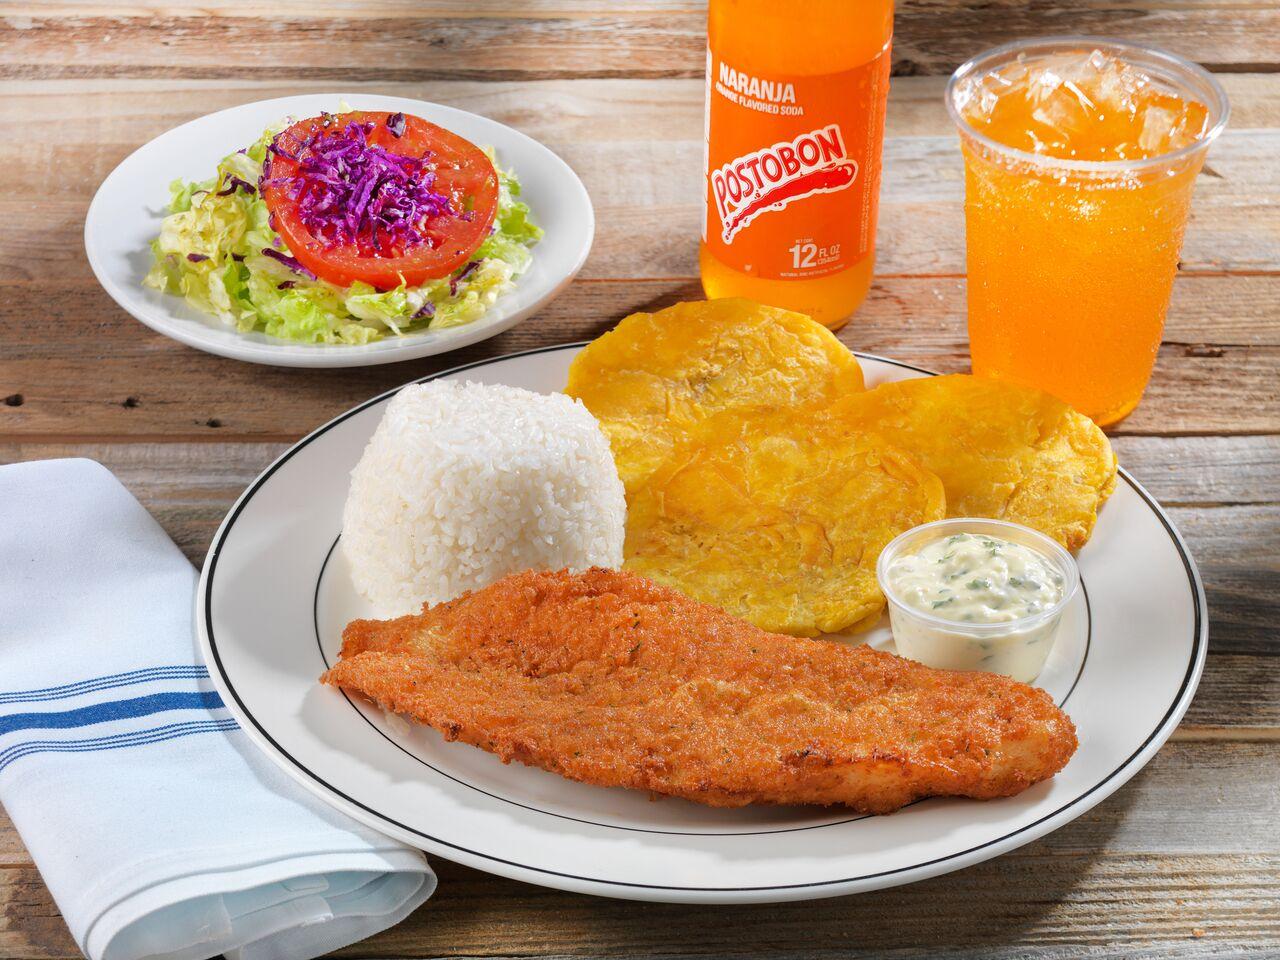 fish-fillet-weston-restaurant.jpeg